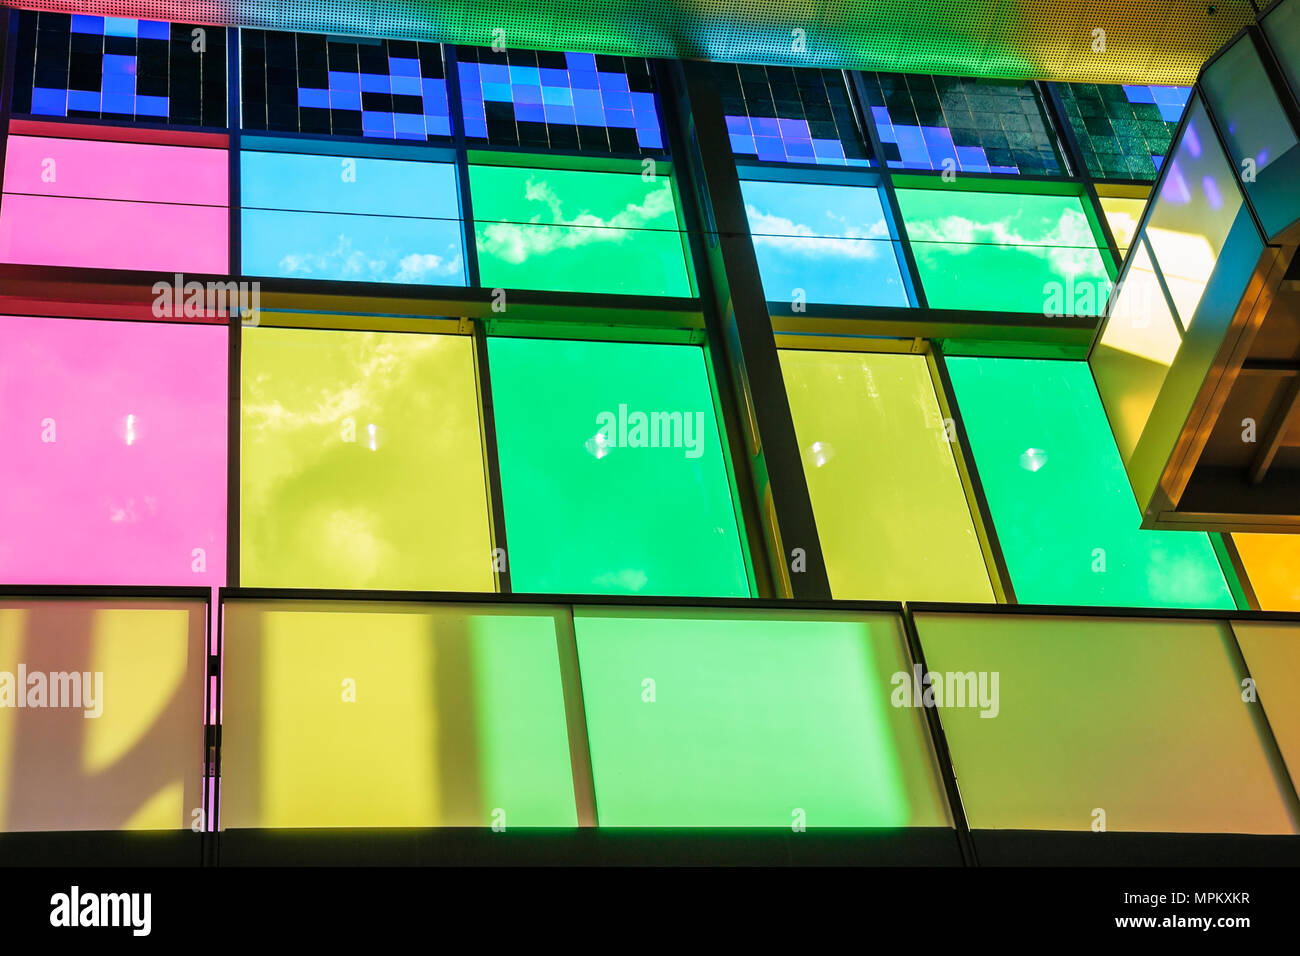 Montreal Canada Palais de Congres Convention Center colored glass panels - Stock Image